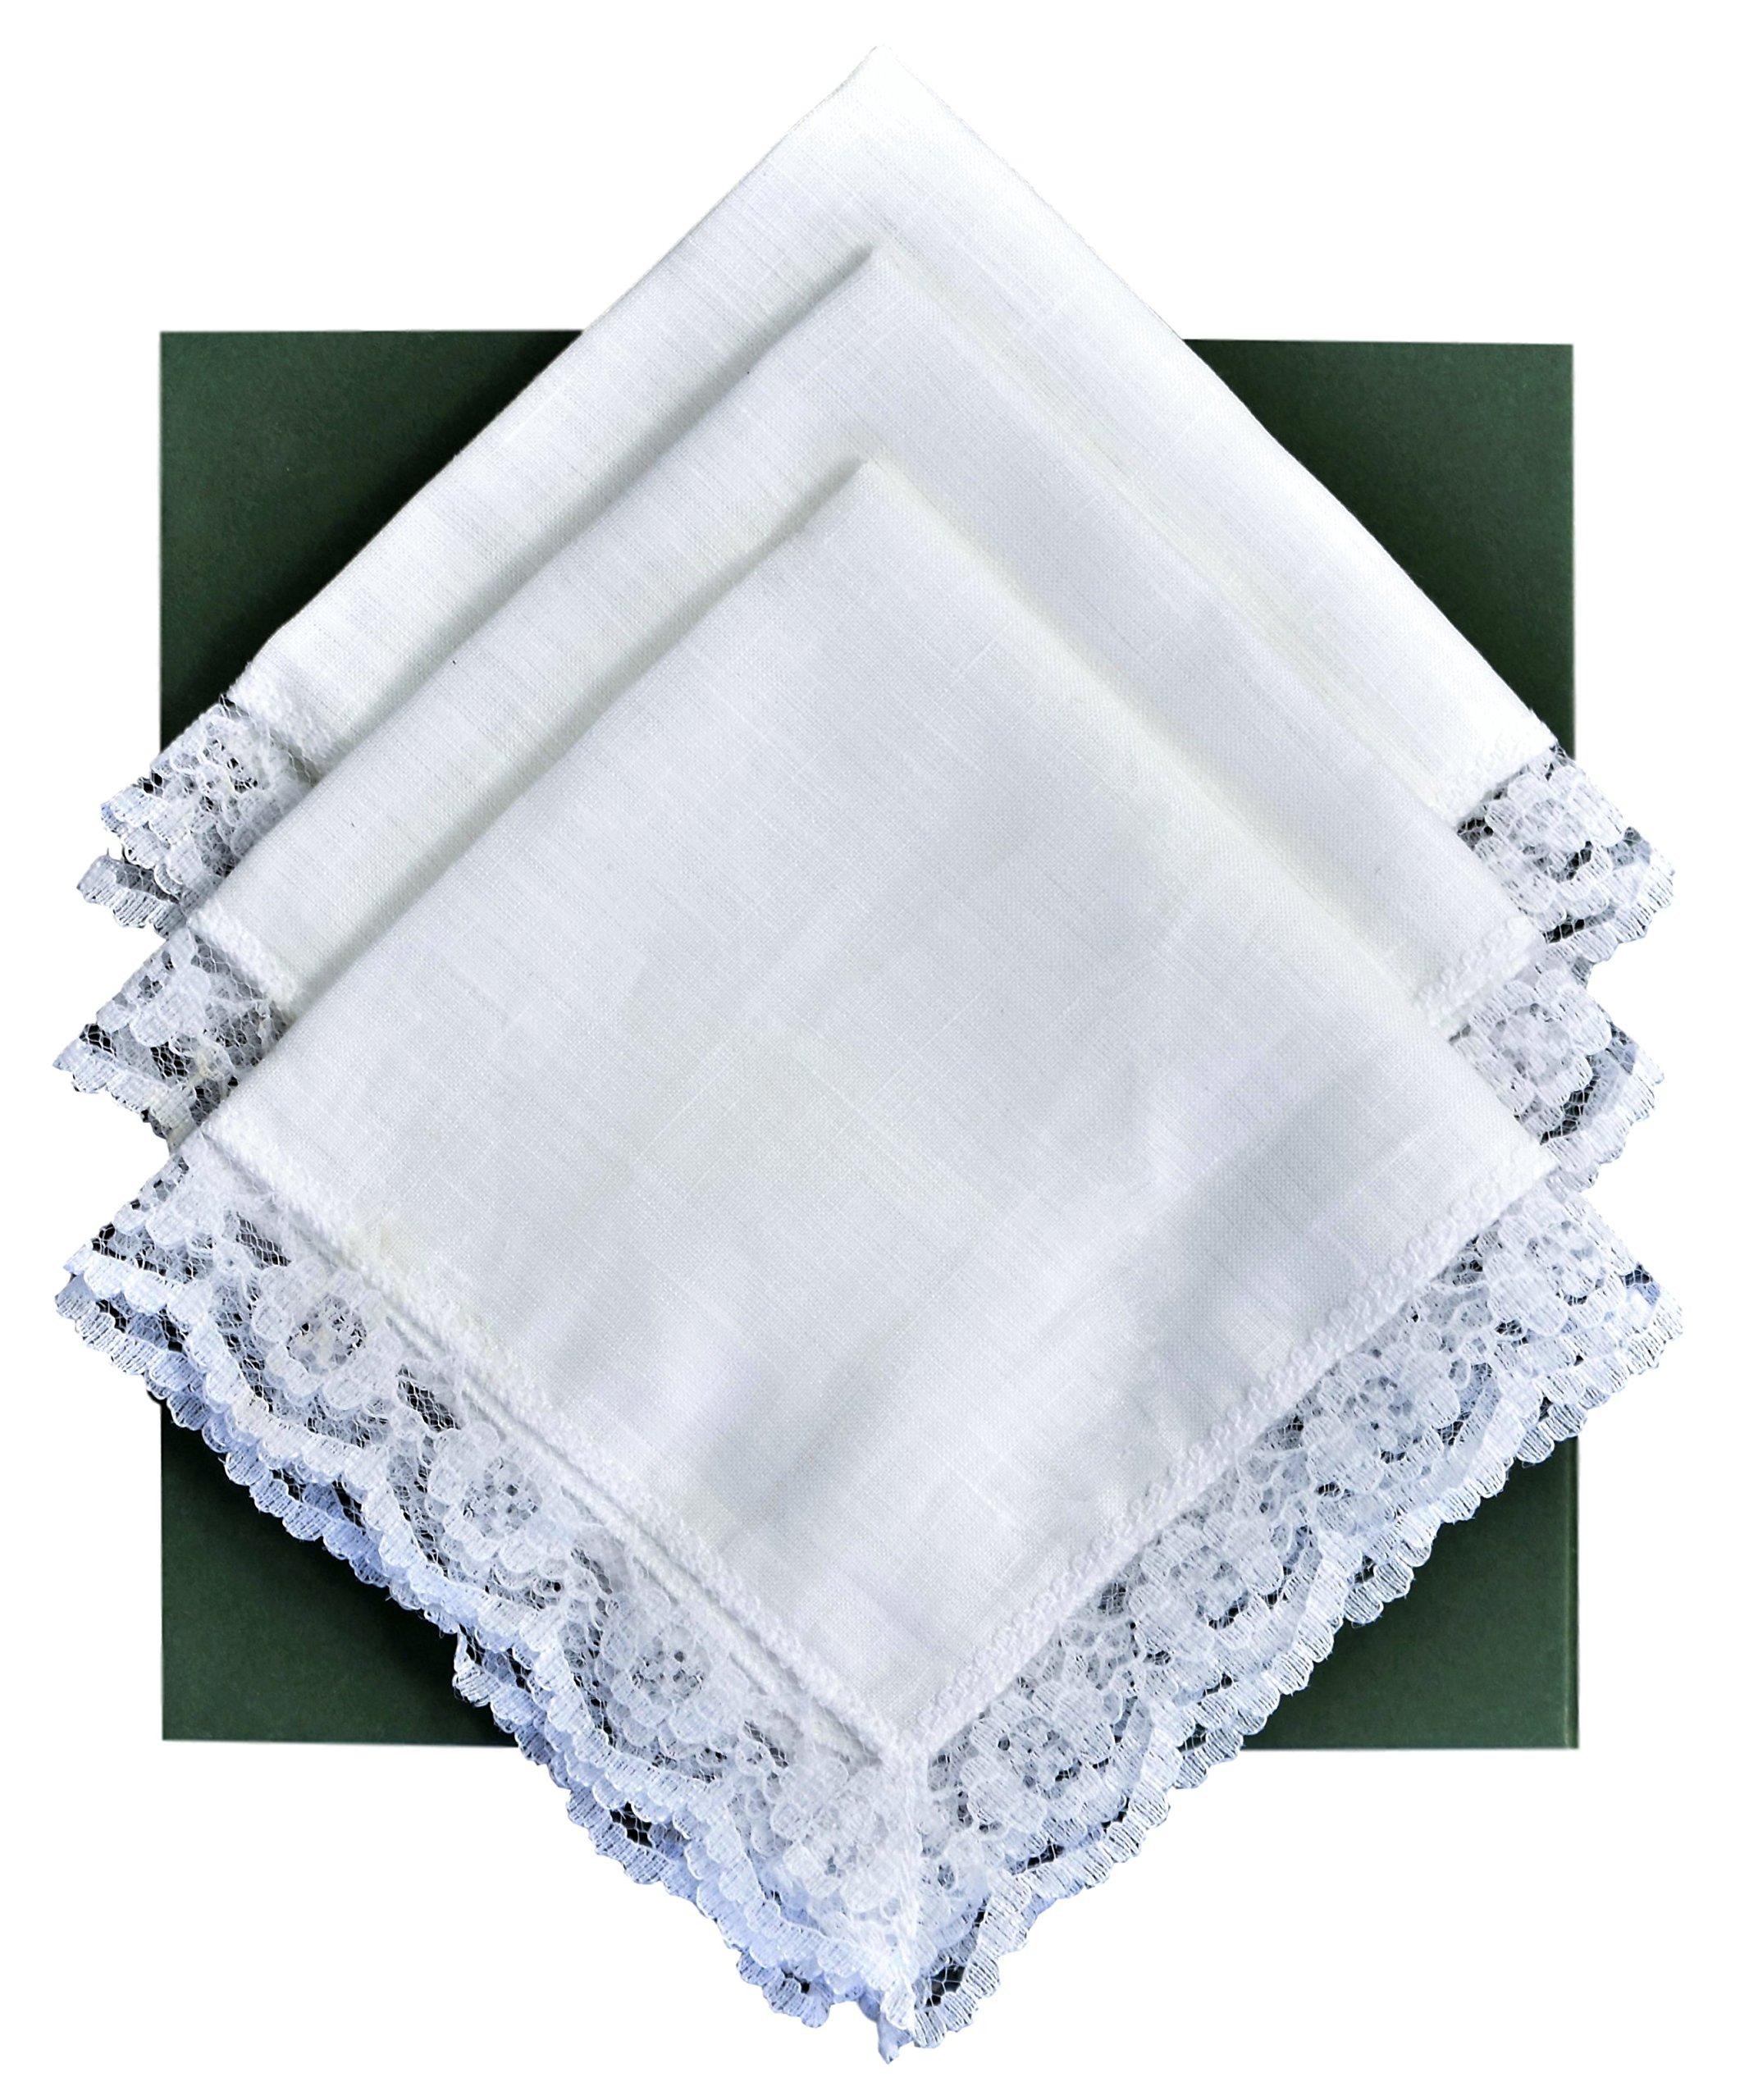 Thomas Ferguson - Ladies White Irish Linen Handkerchief - Pack of 3 In Gift Box by Thomas Ferguson Irish Linen (Image #1)